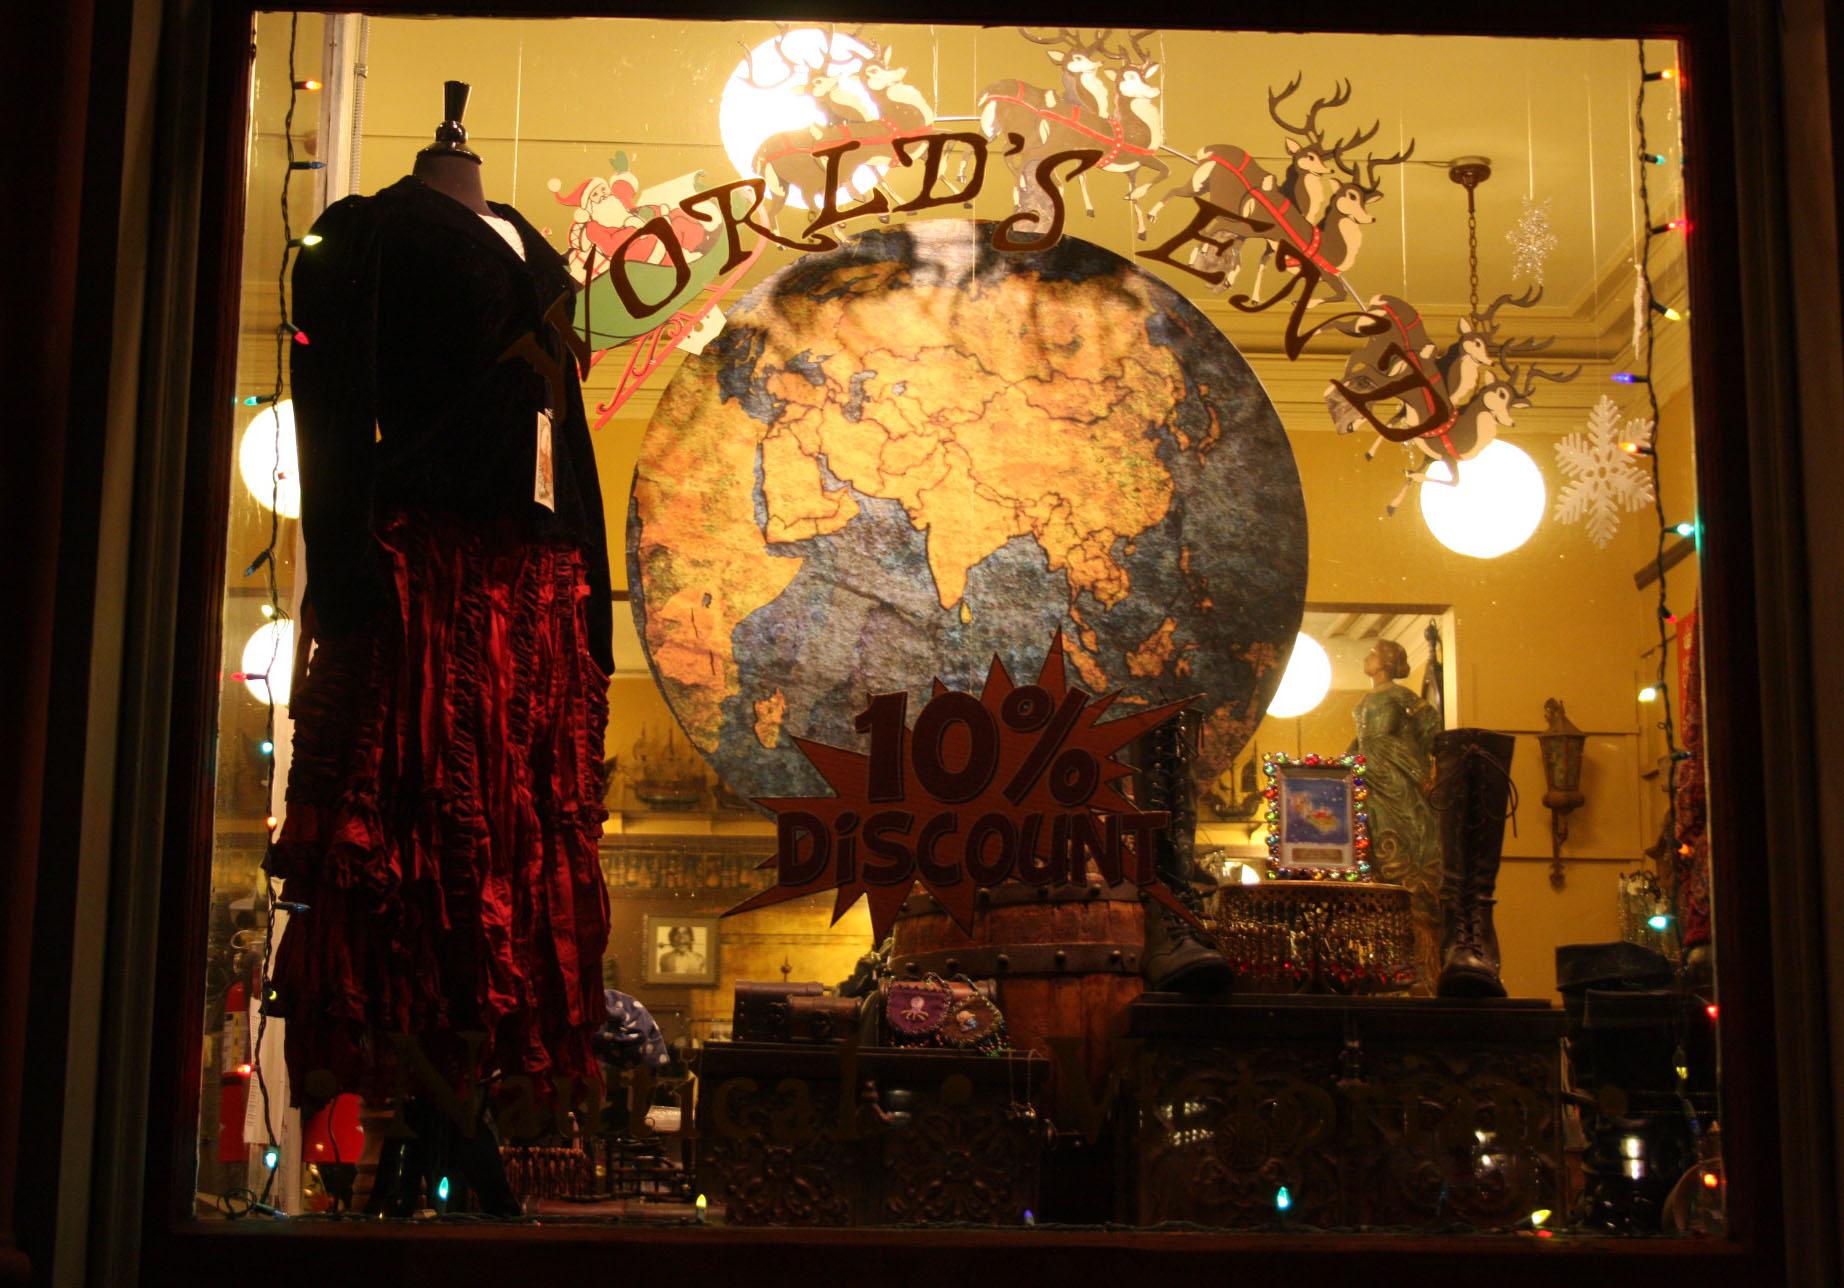 World's End, Port Townsend, WA